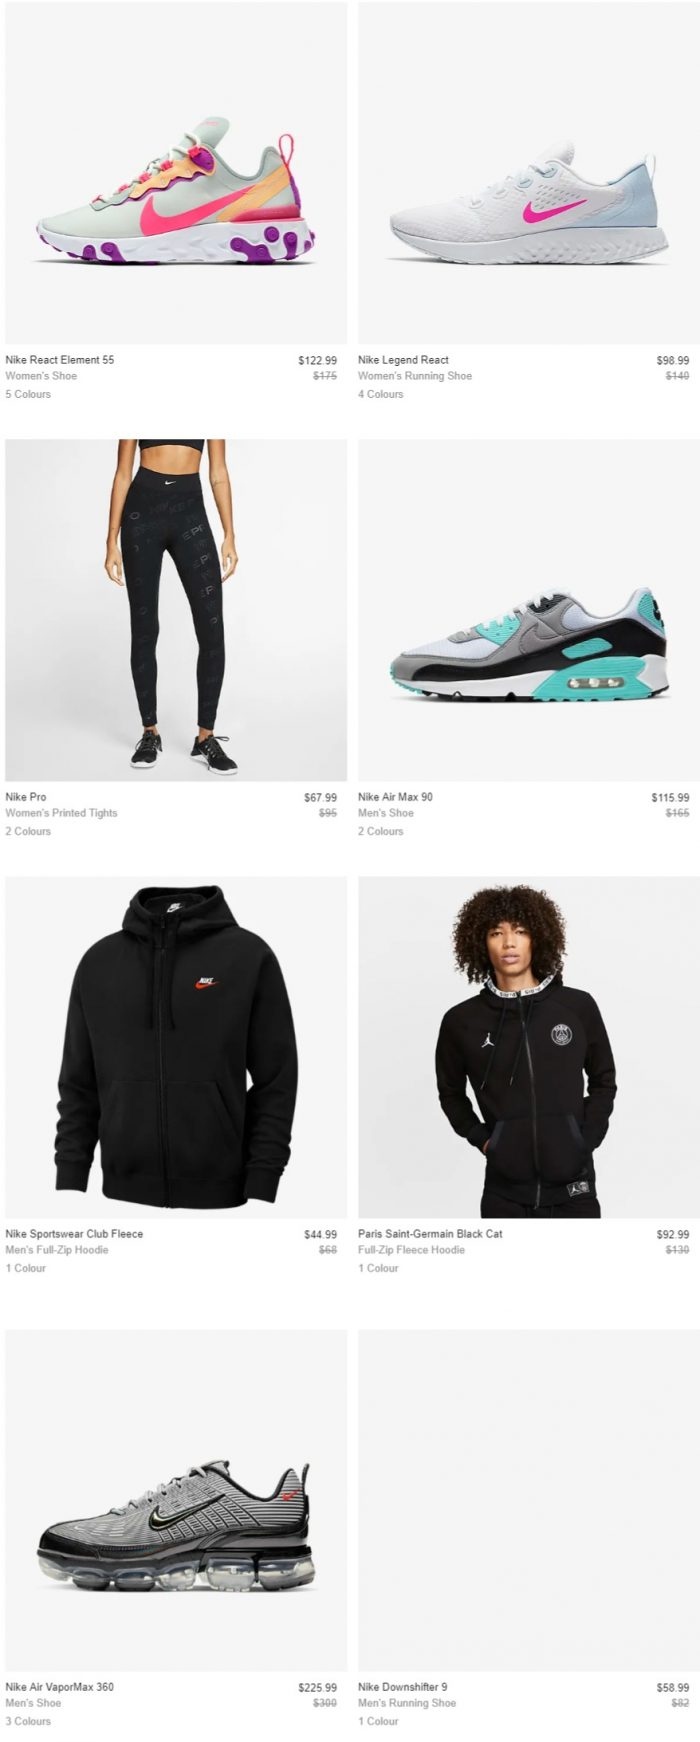 Nike 耐克 折扣区时尚运动服饰、运动鞋、手提包 5.8折起